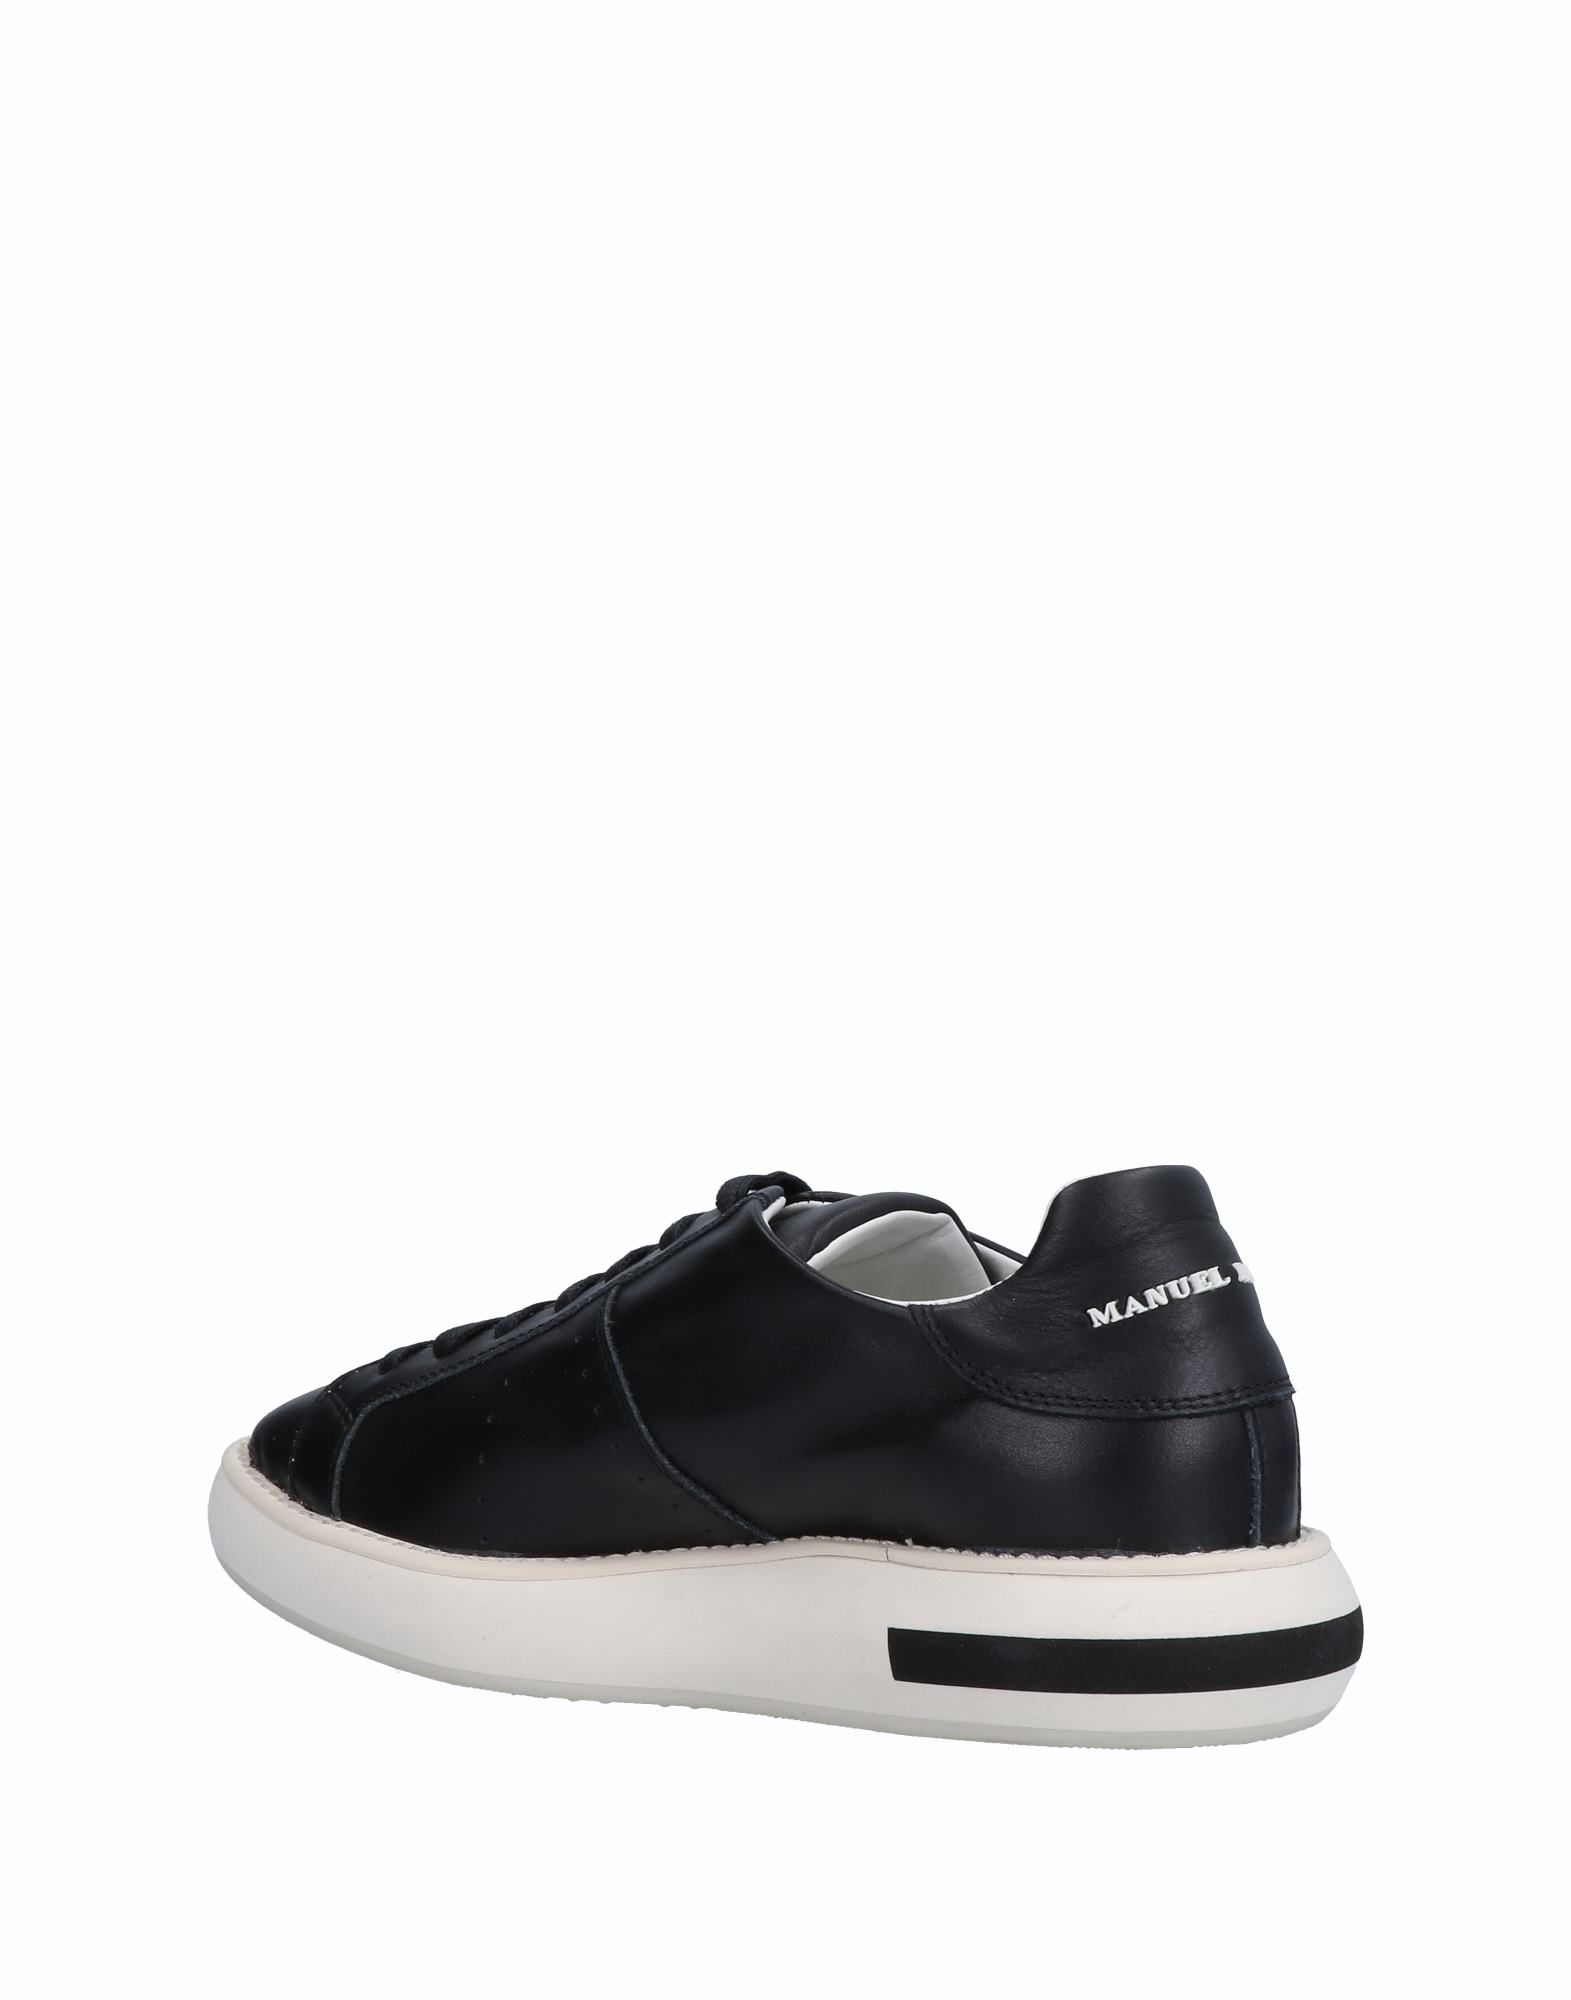 Stilvolle billige Schuhe Manuel Manuel Manuel Barceló Sneakers Damen  11512539DS 8ceffb